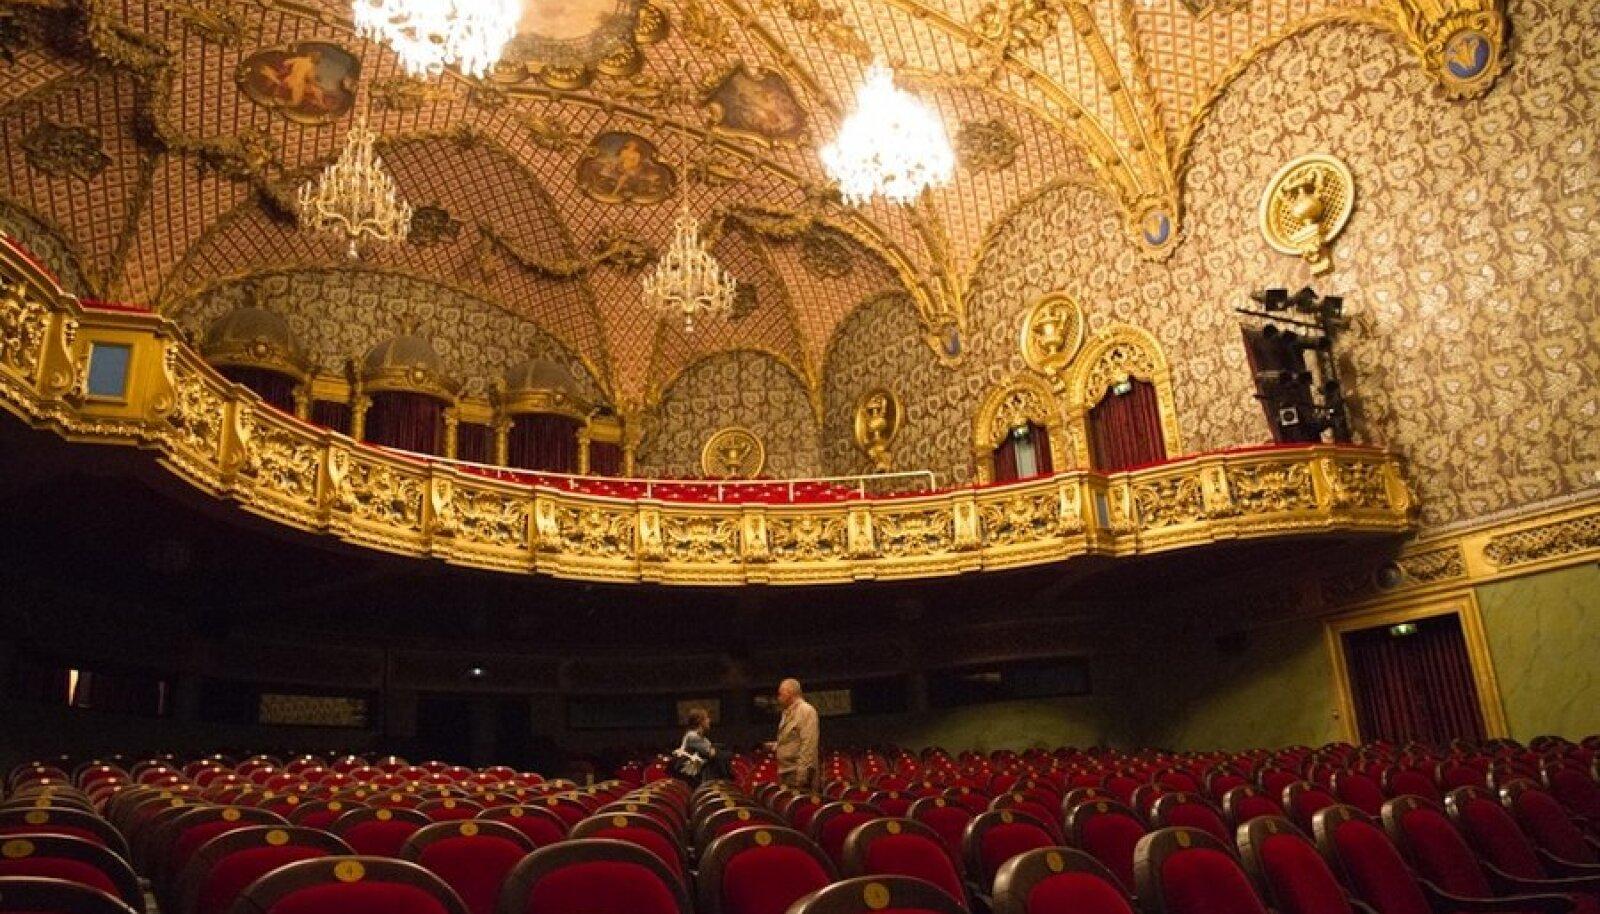 Vene teatris